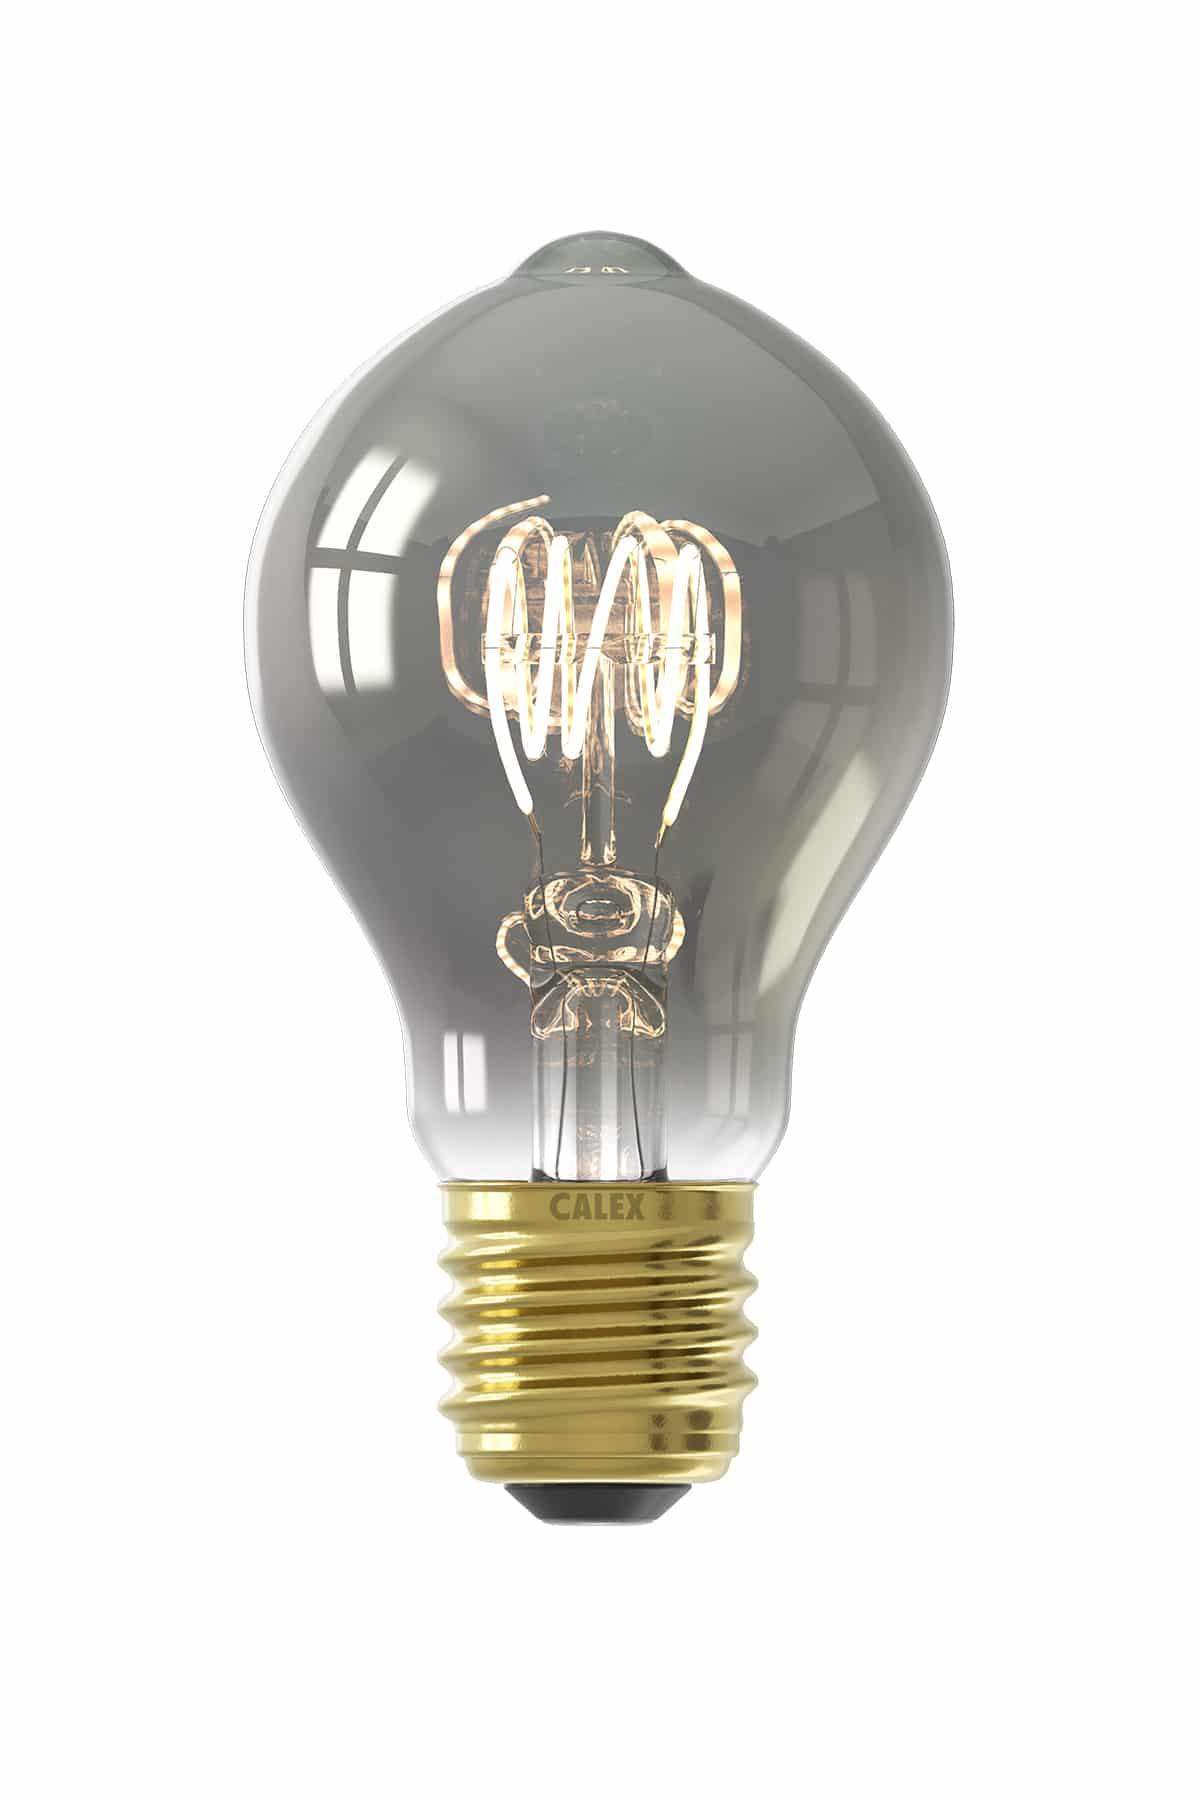 Calex Titanium Standard Bulb Led Lamp E27 8211 100 Lumen